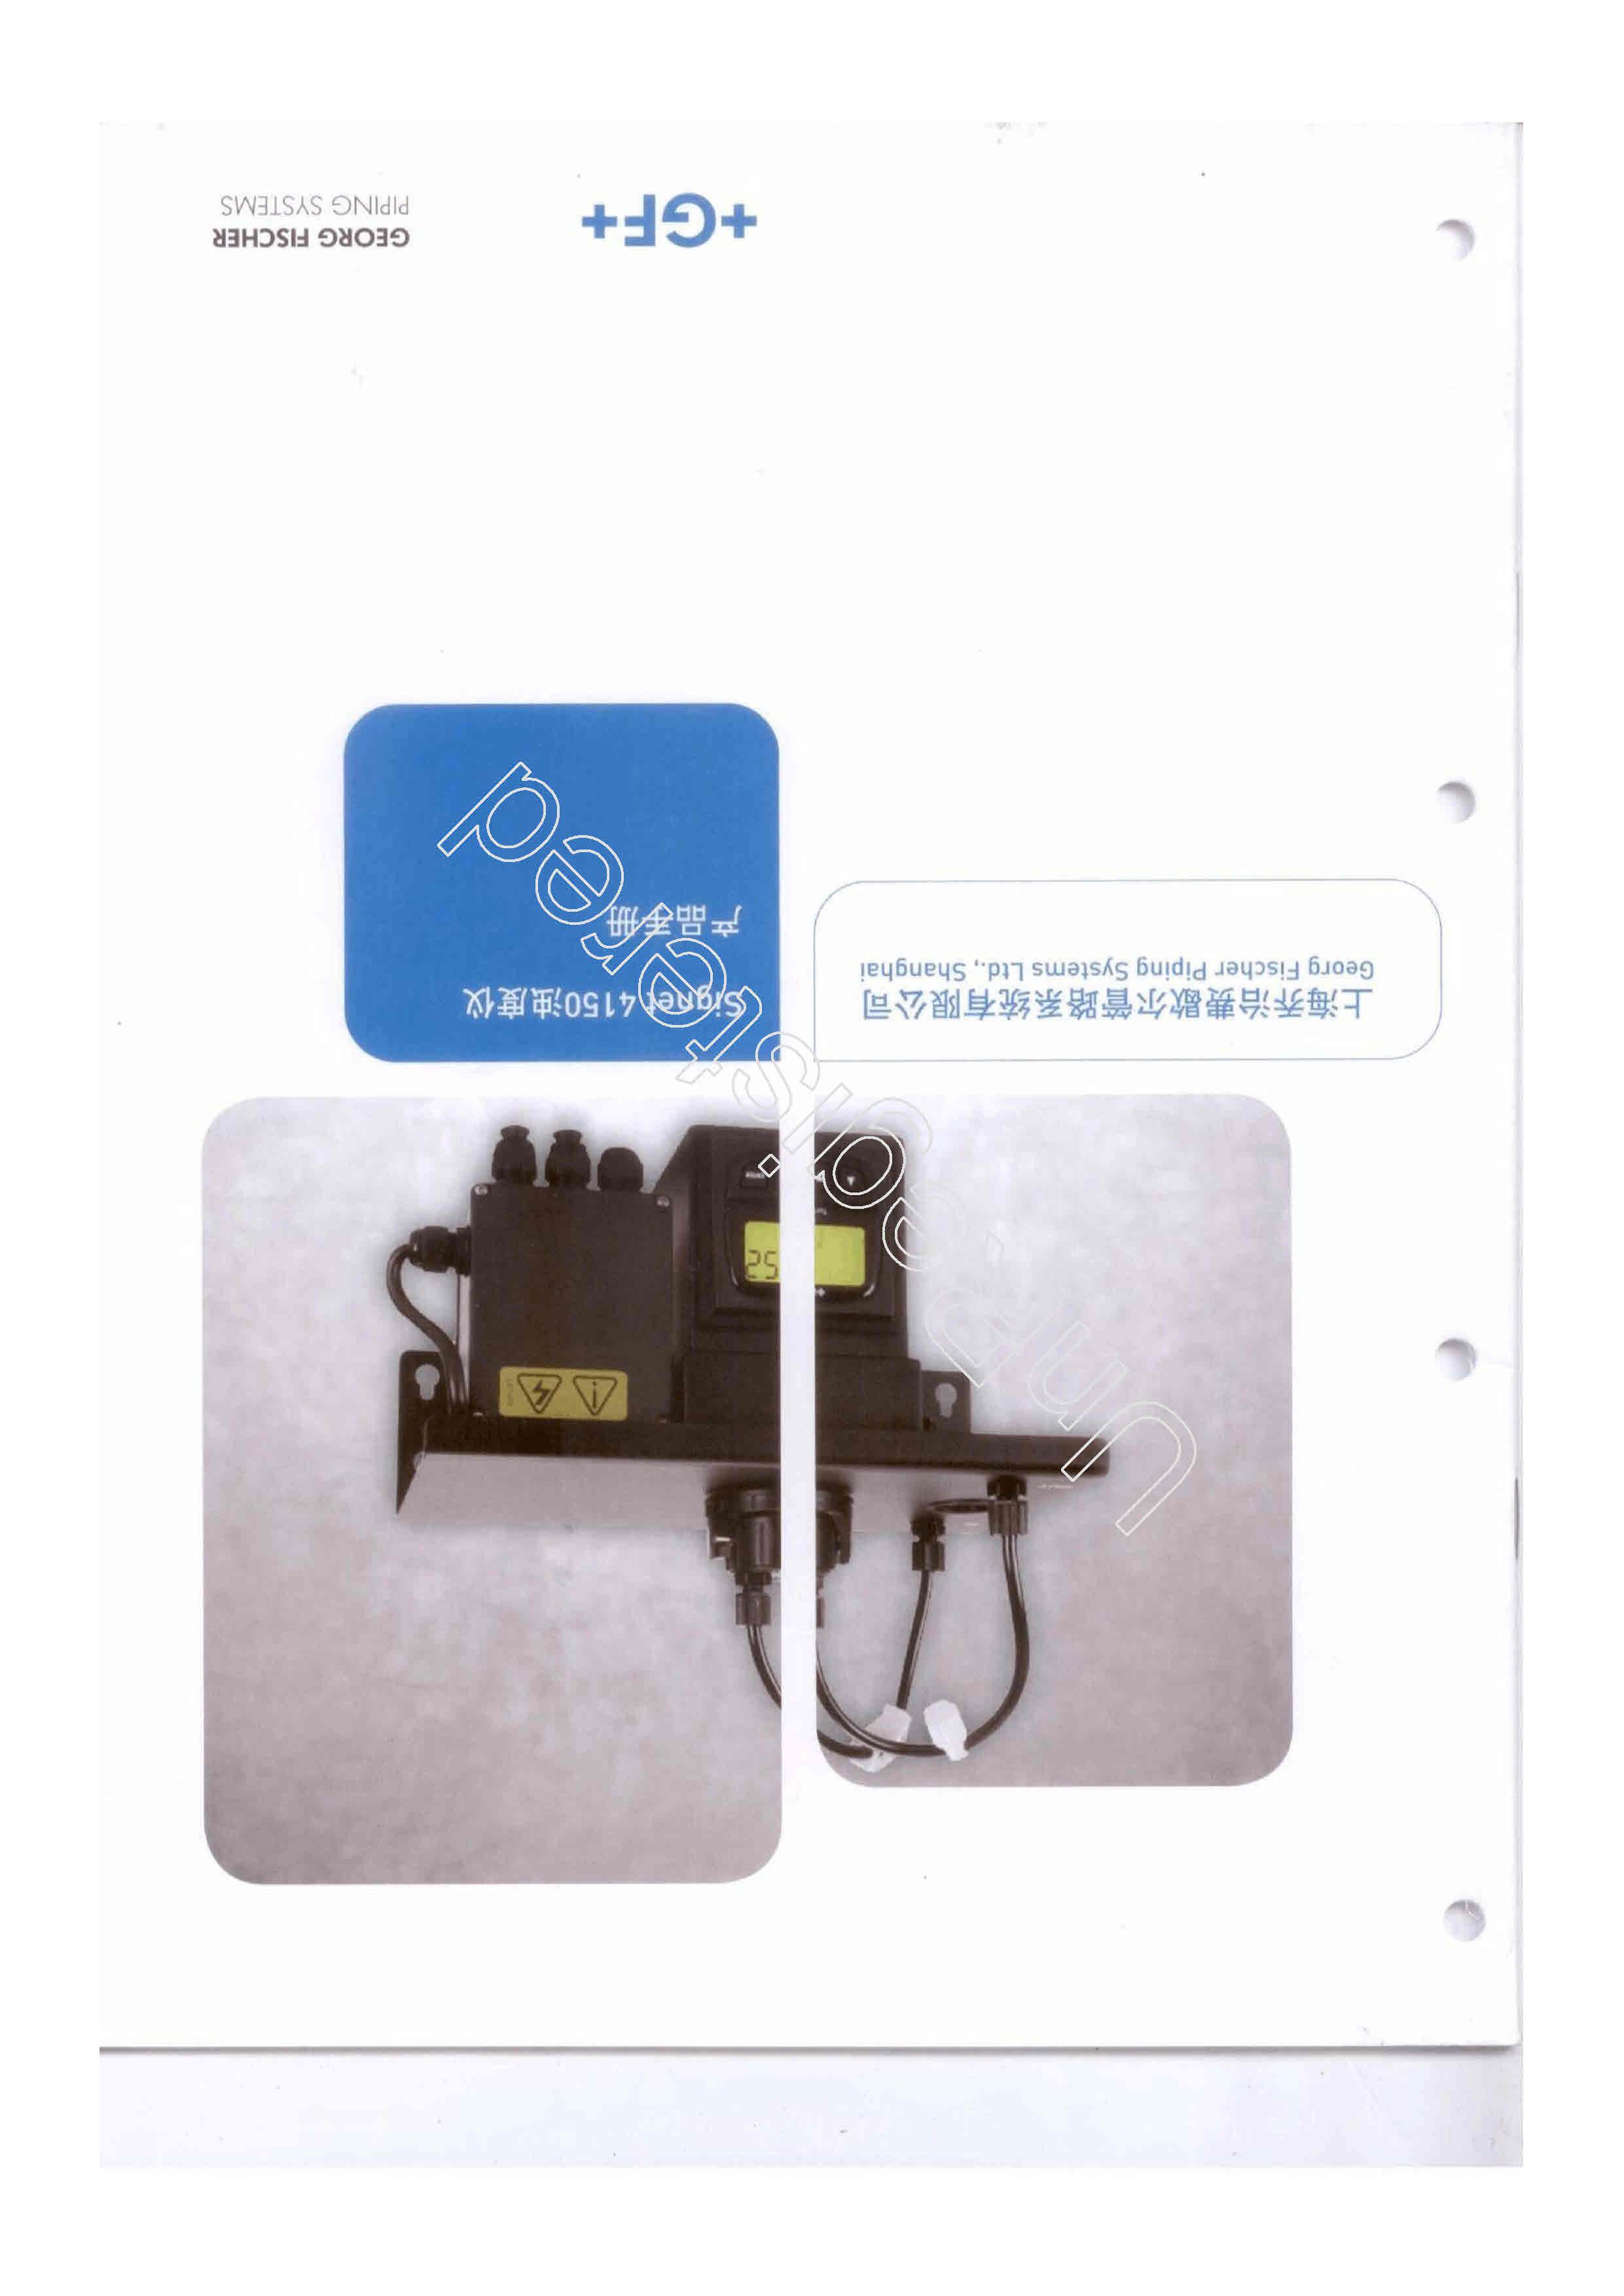 GF 4150浊度计 操作手册